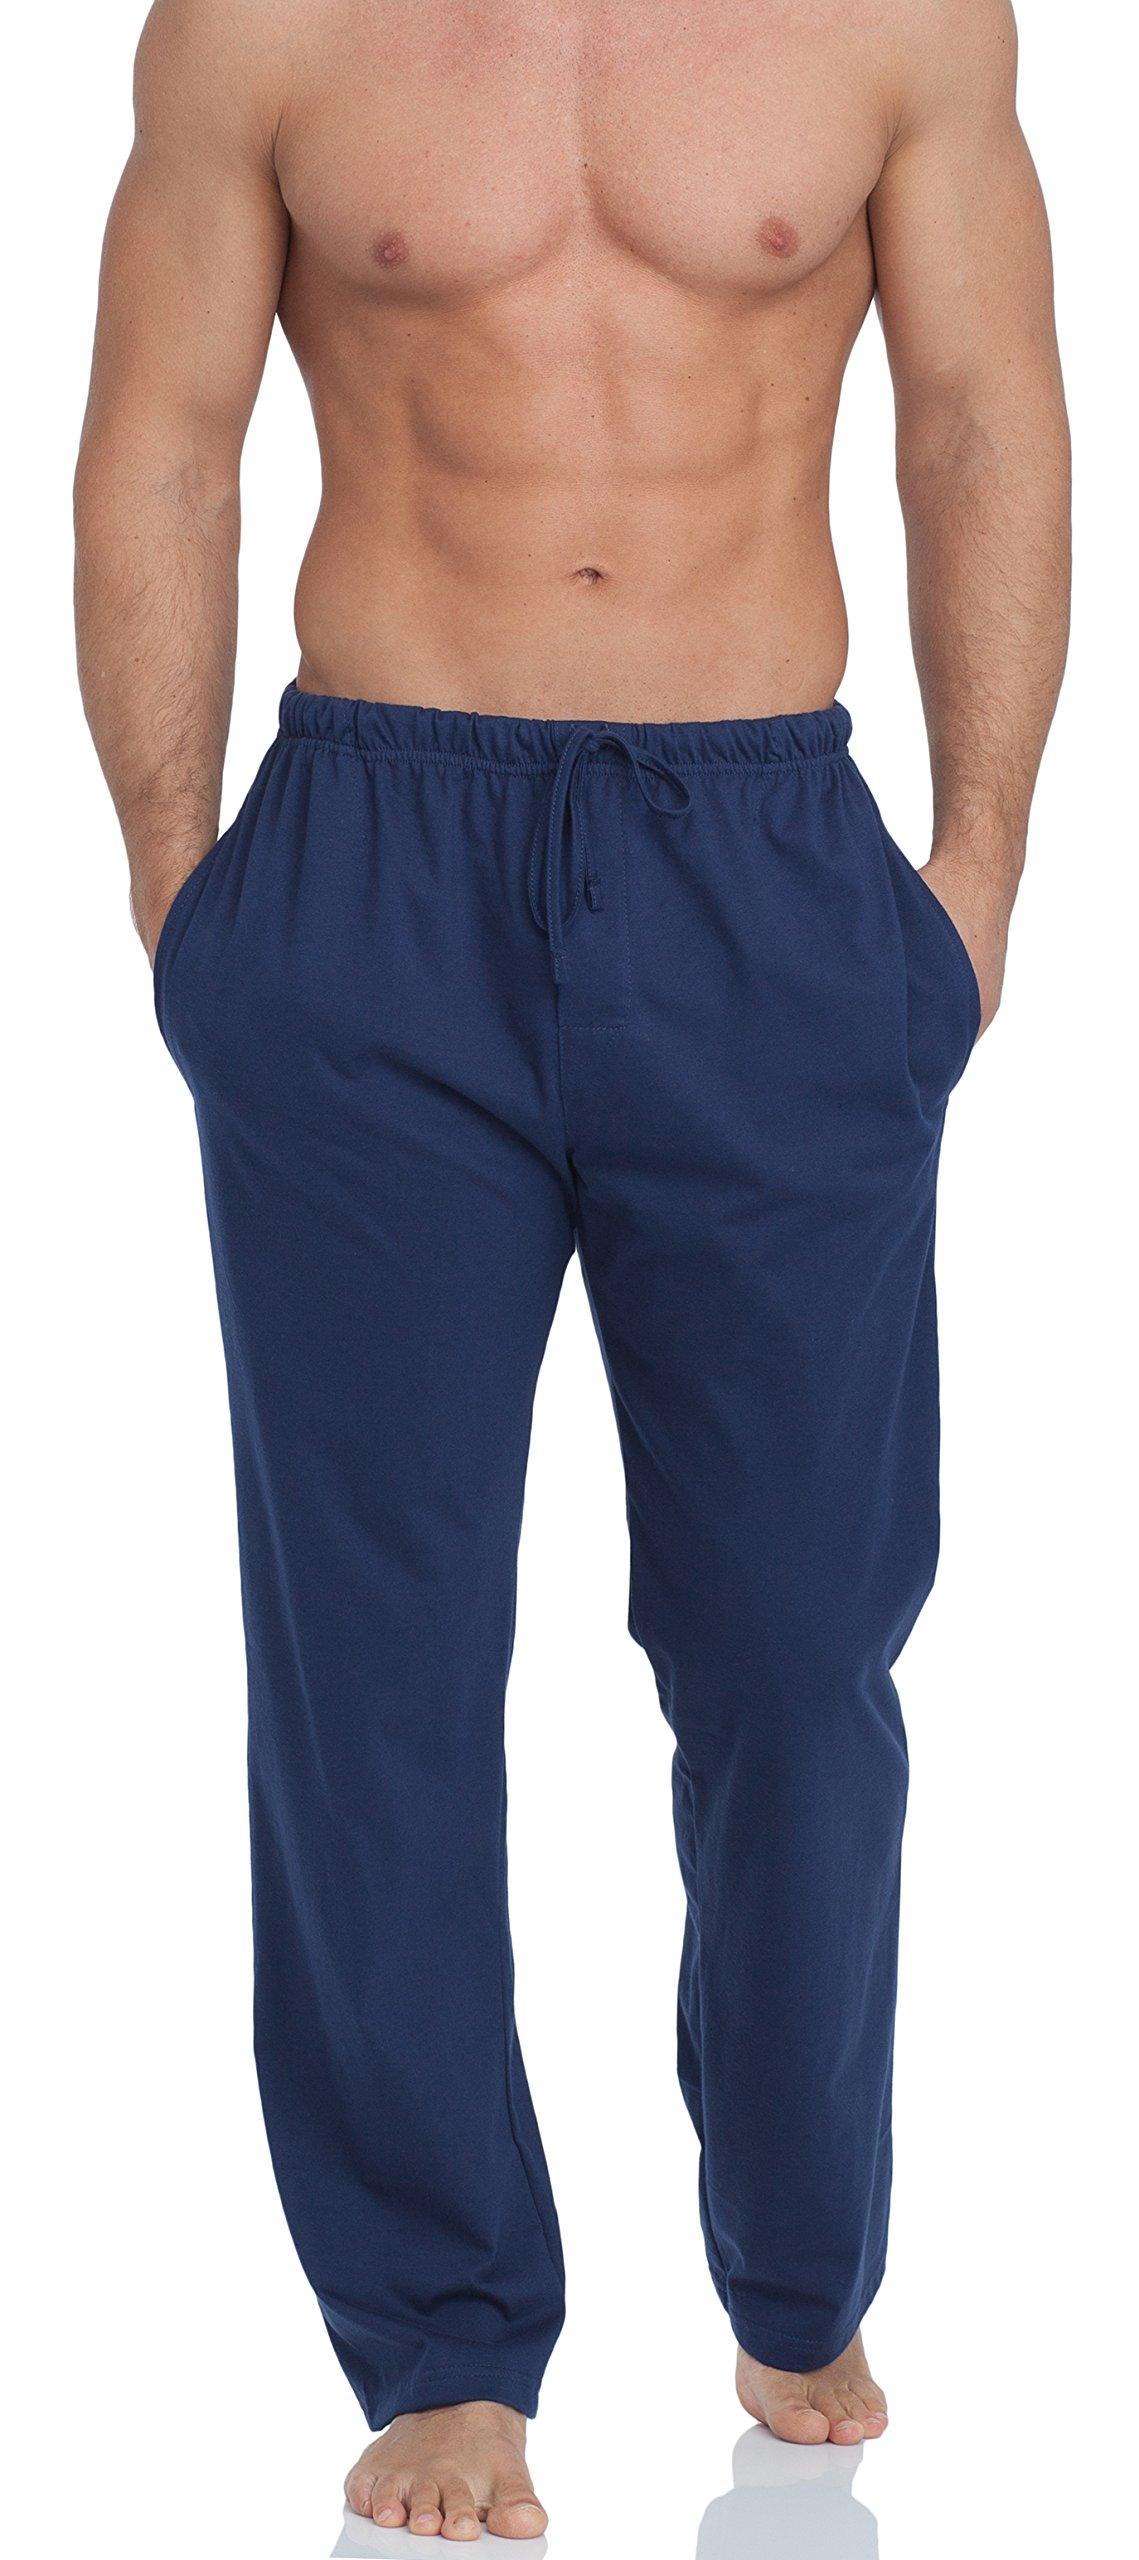 Timone Pantalones Largos de Pijamas 100% Algodón Hombre TPP-001 product image